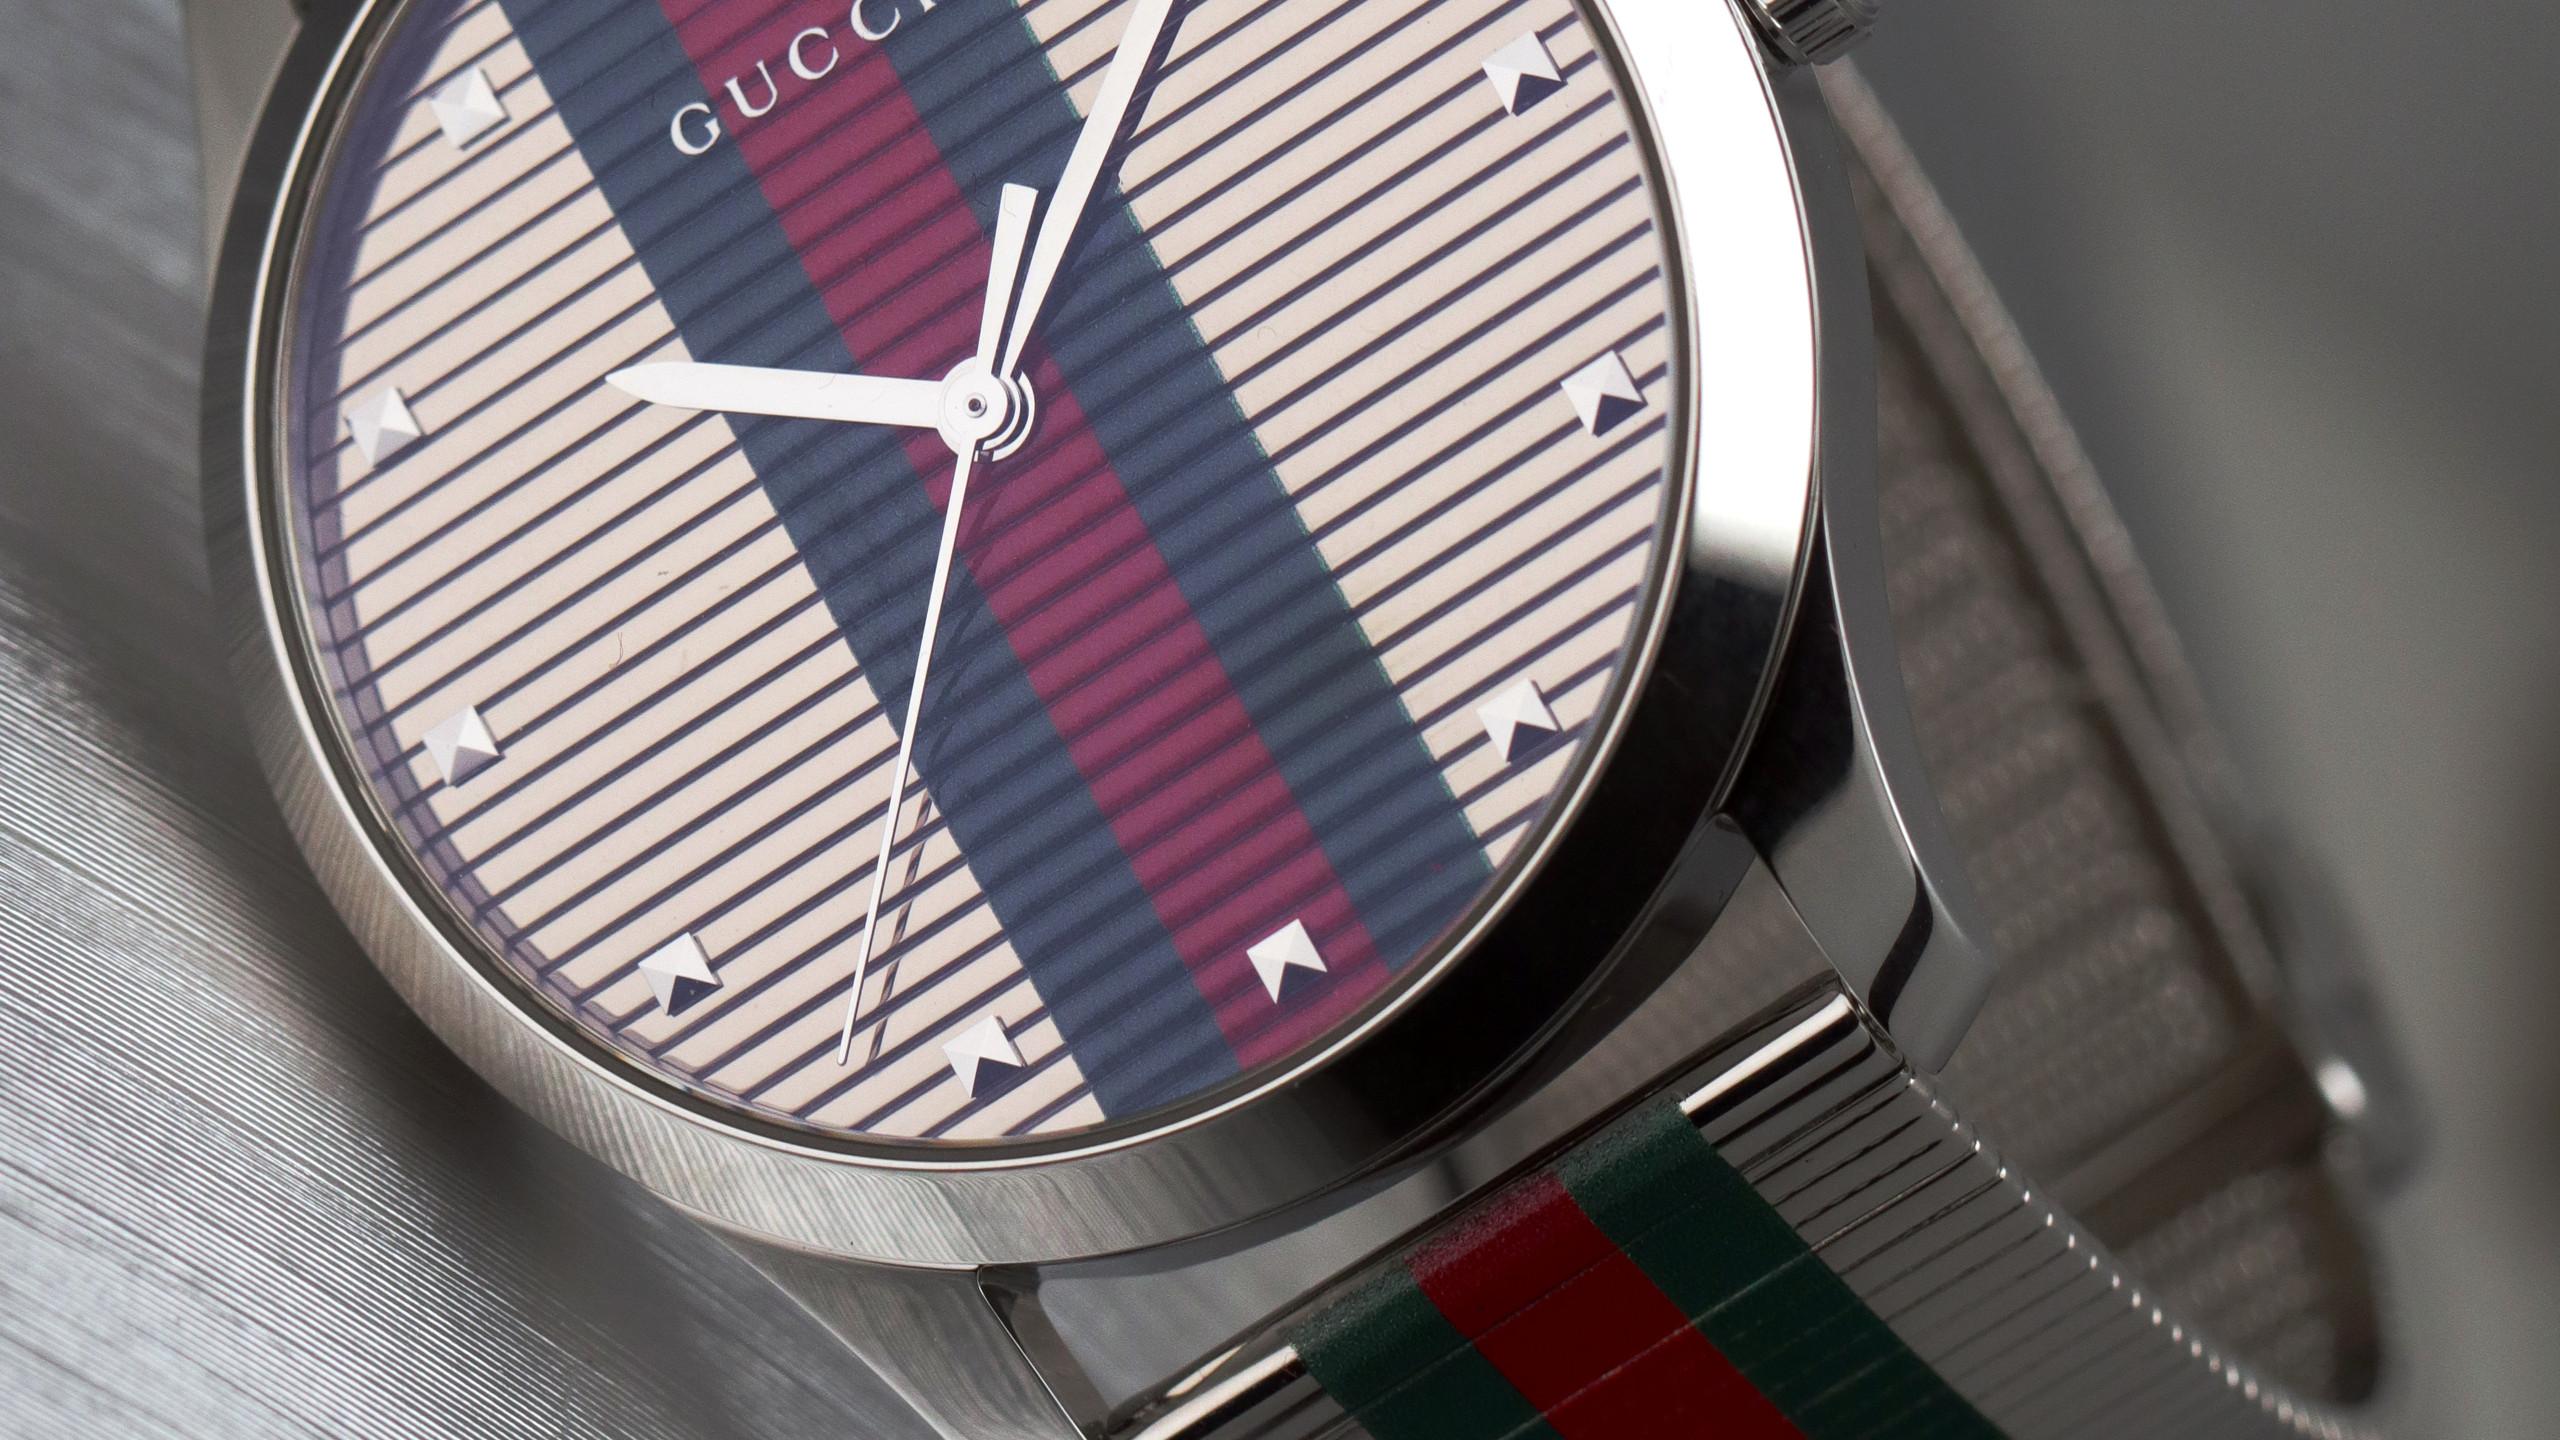 G-Timeless當代腕錶—— 綠紅綠條紋